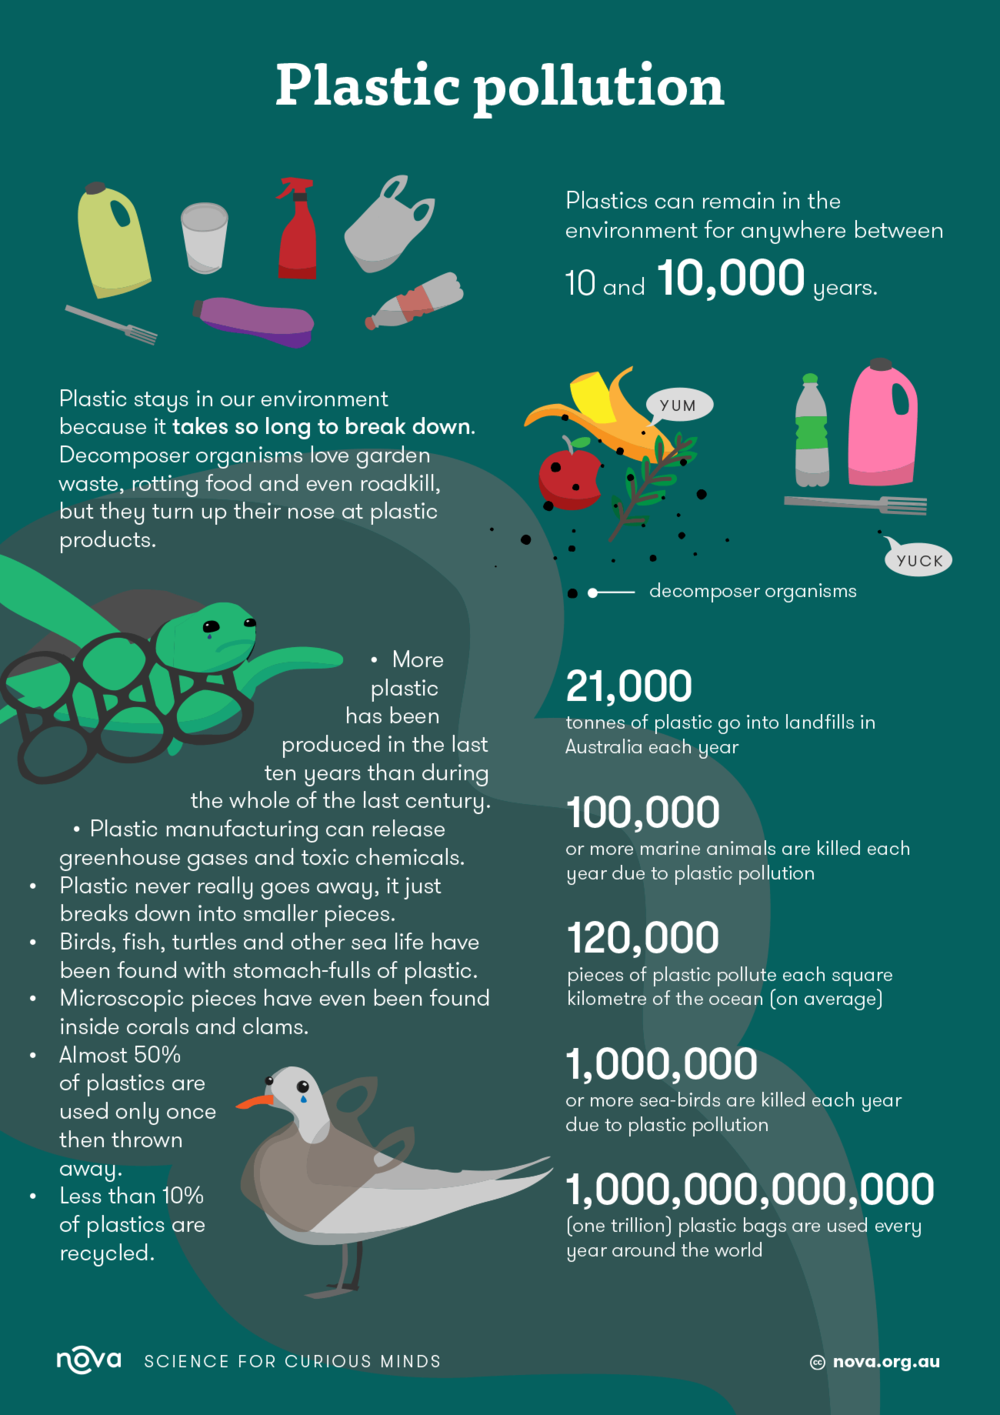 plastics-infographic-20160728-1300px.png